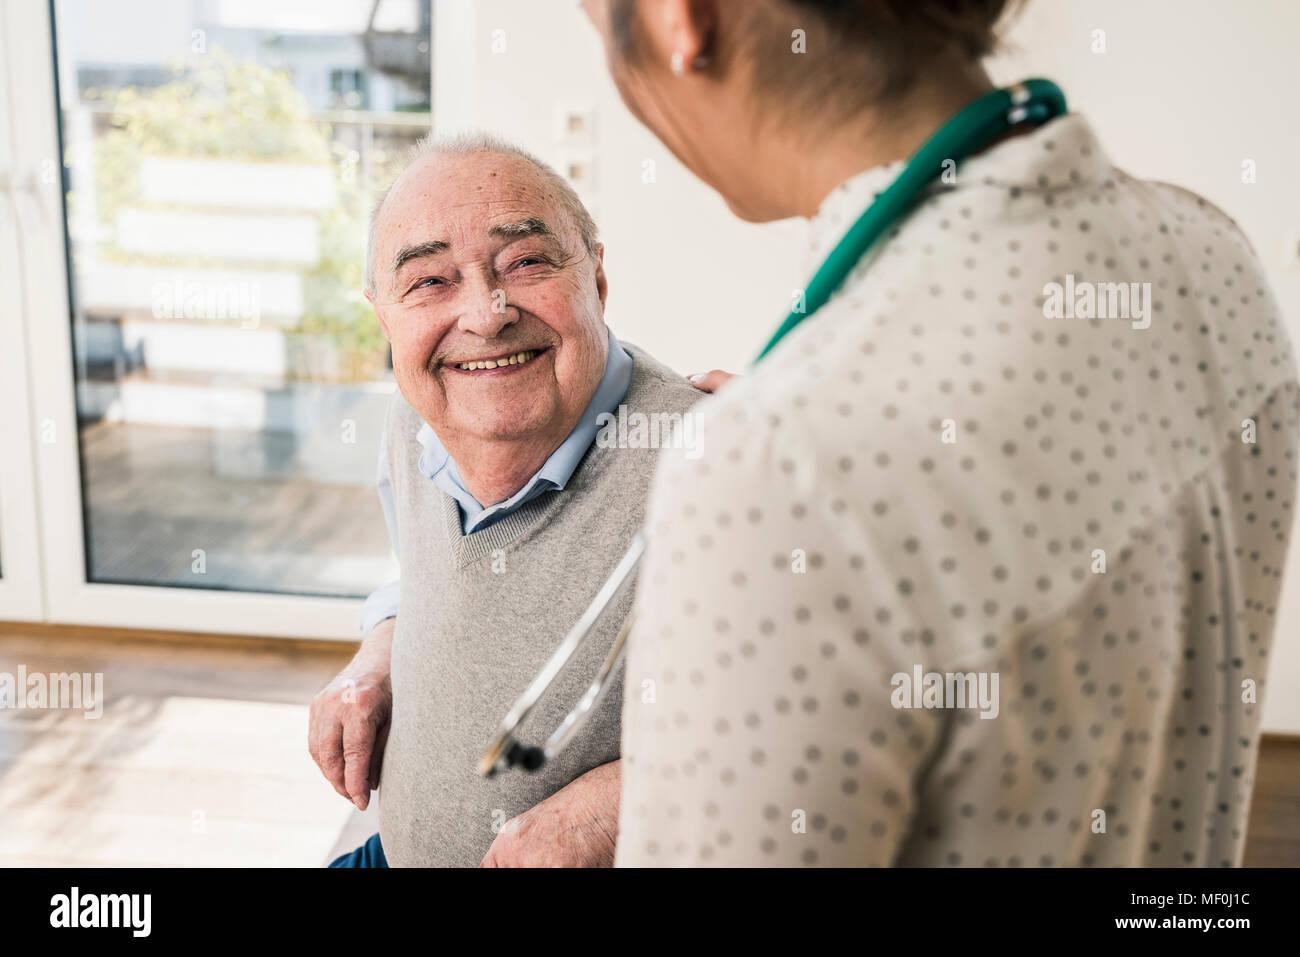 Senior man smiling at nurse at home Photo Stock